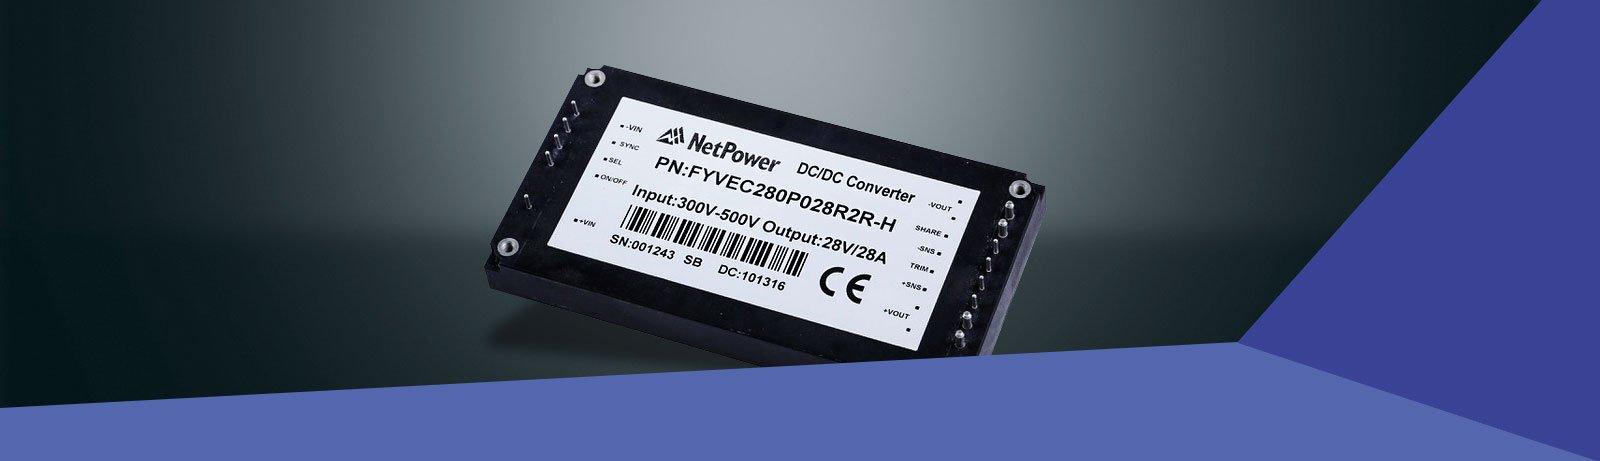 NetPower – Robuste DC/DC Konverter